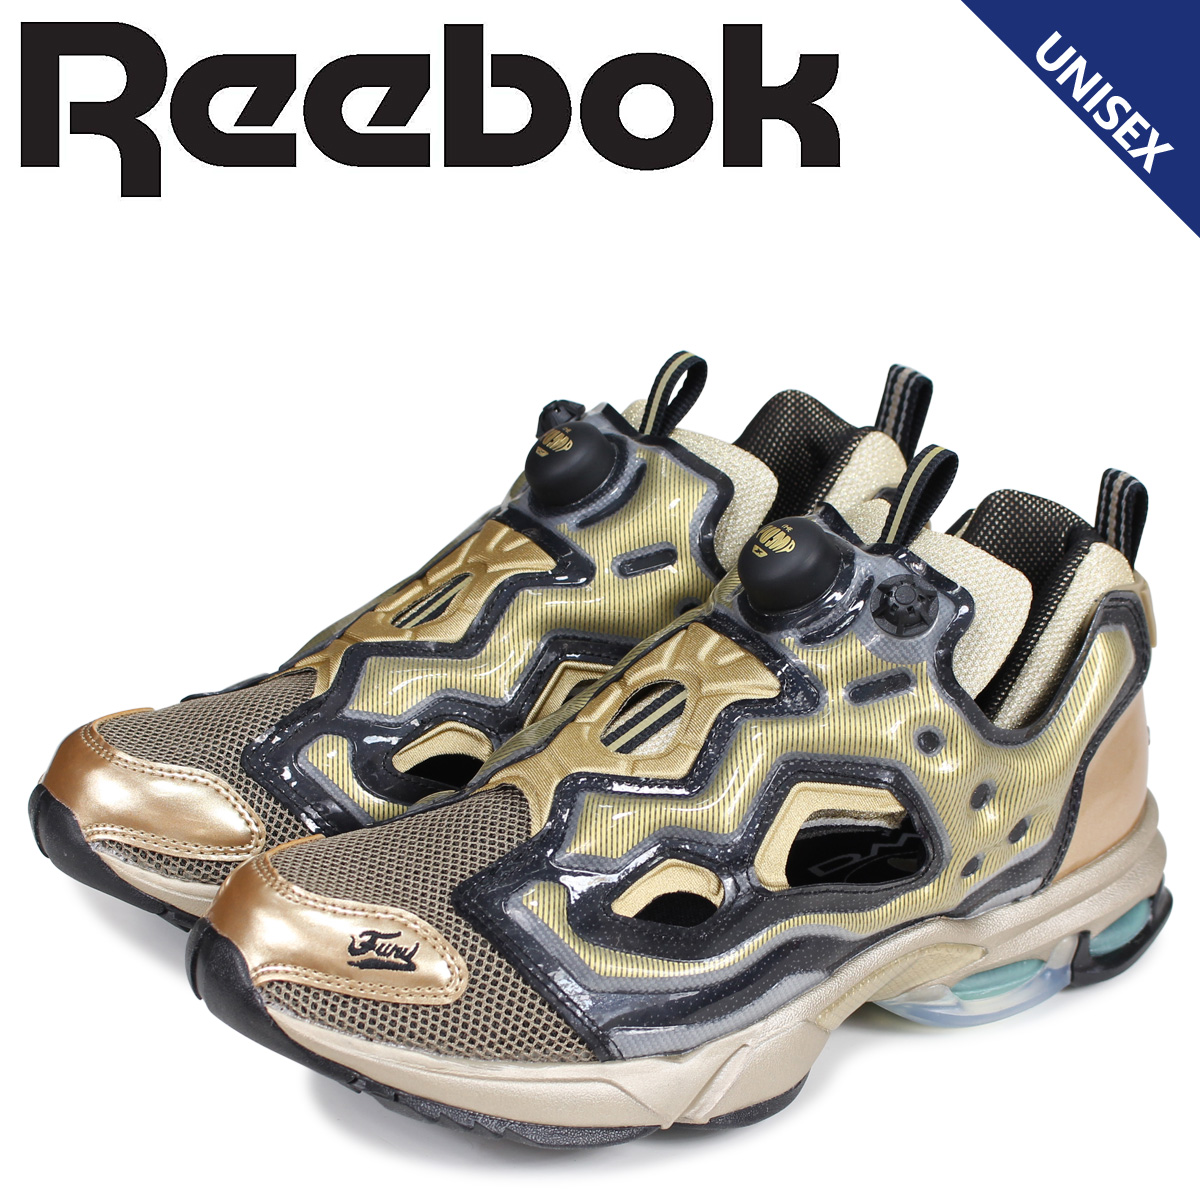 Reebok リーボック フューリー ディーエムエックス スニーカー メンズ レディース FURY DMX TXT ベージュ DV4601